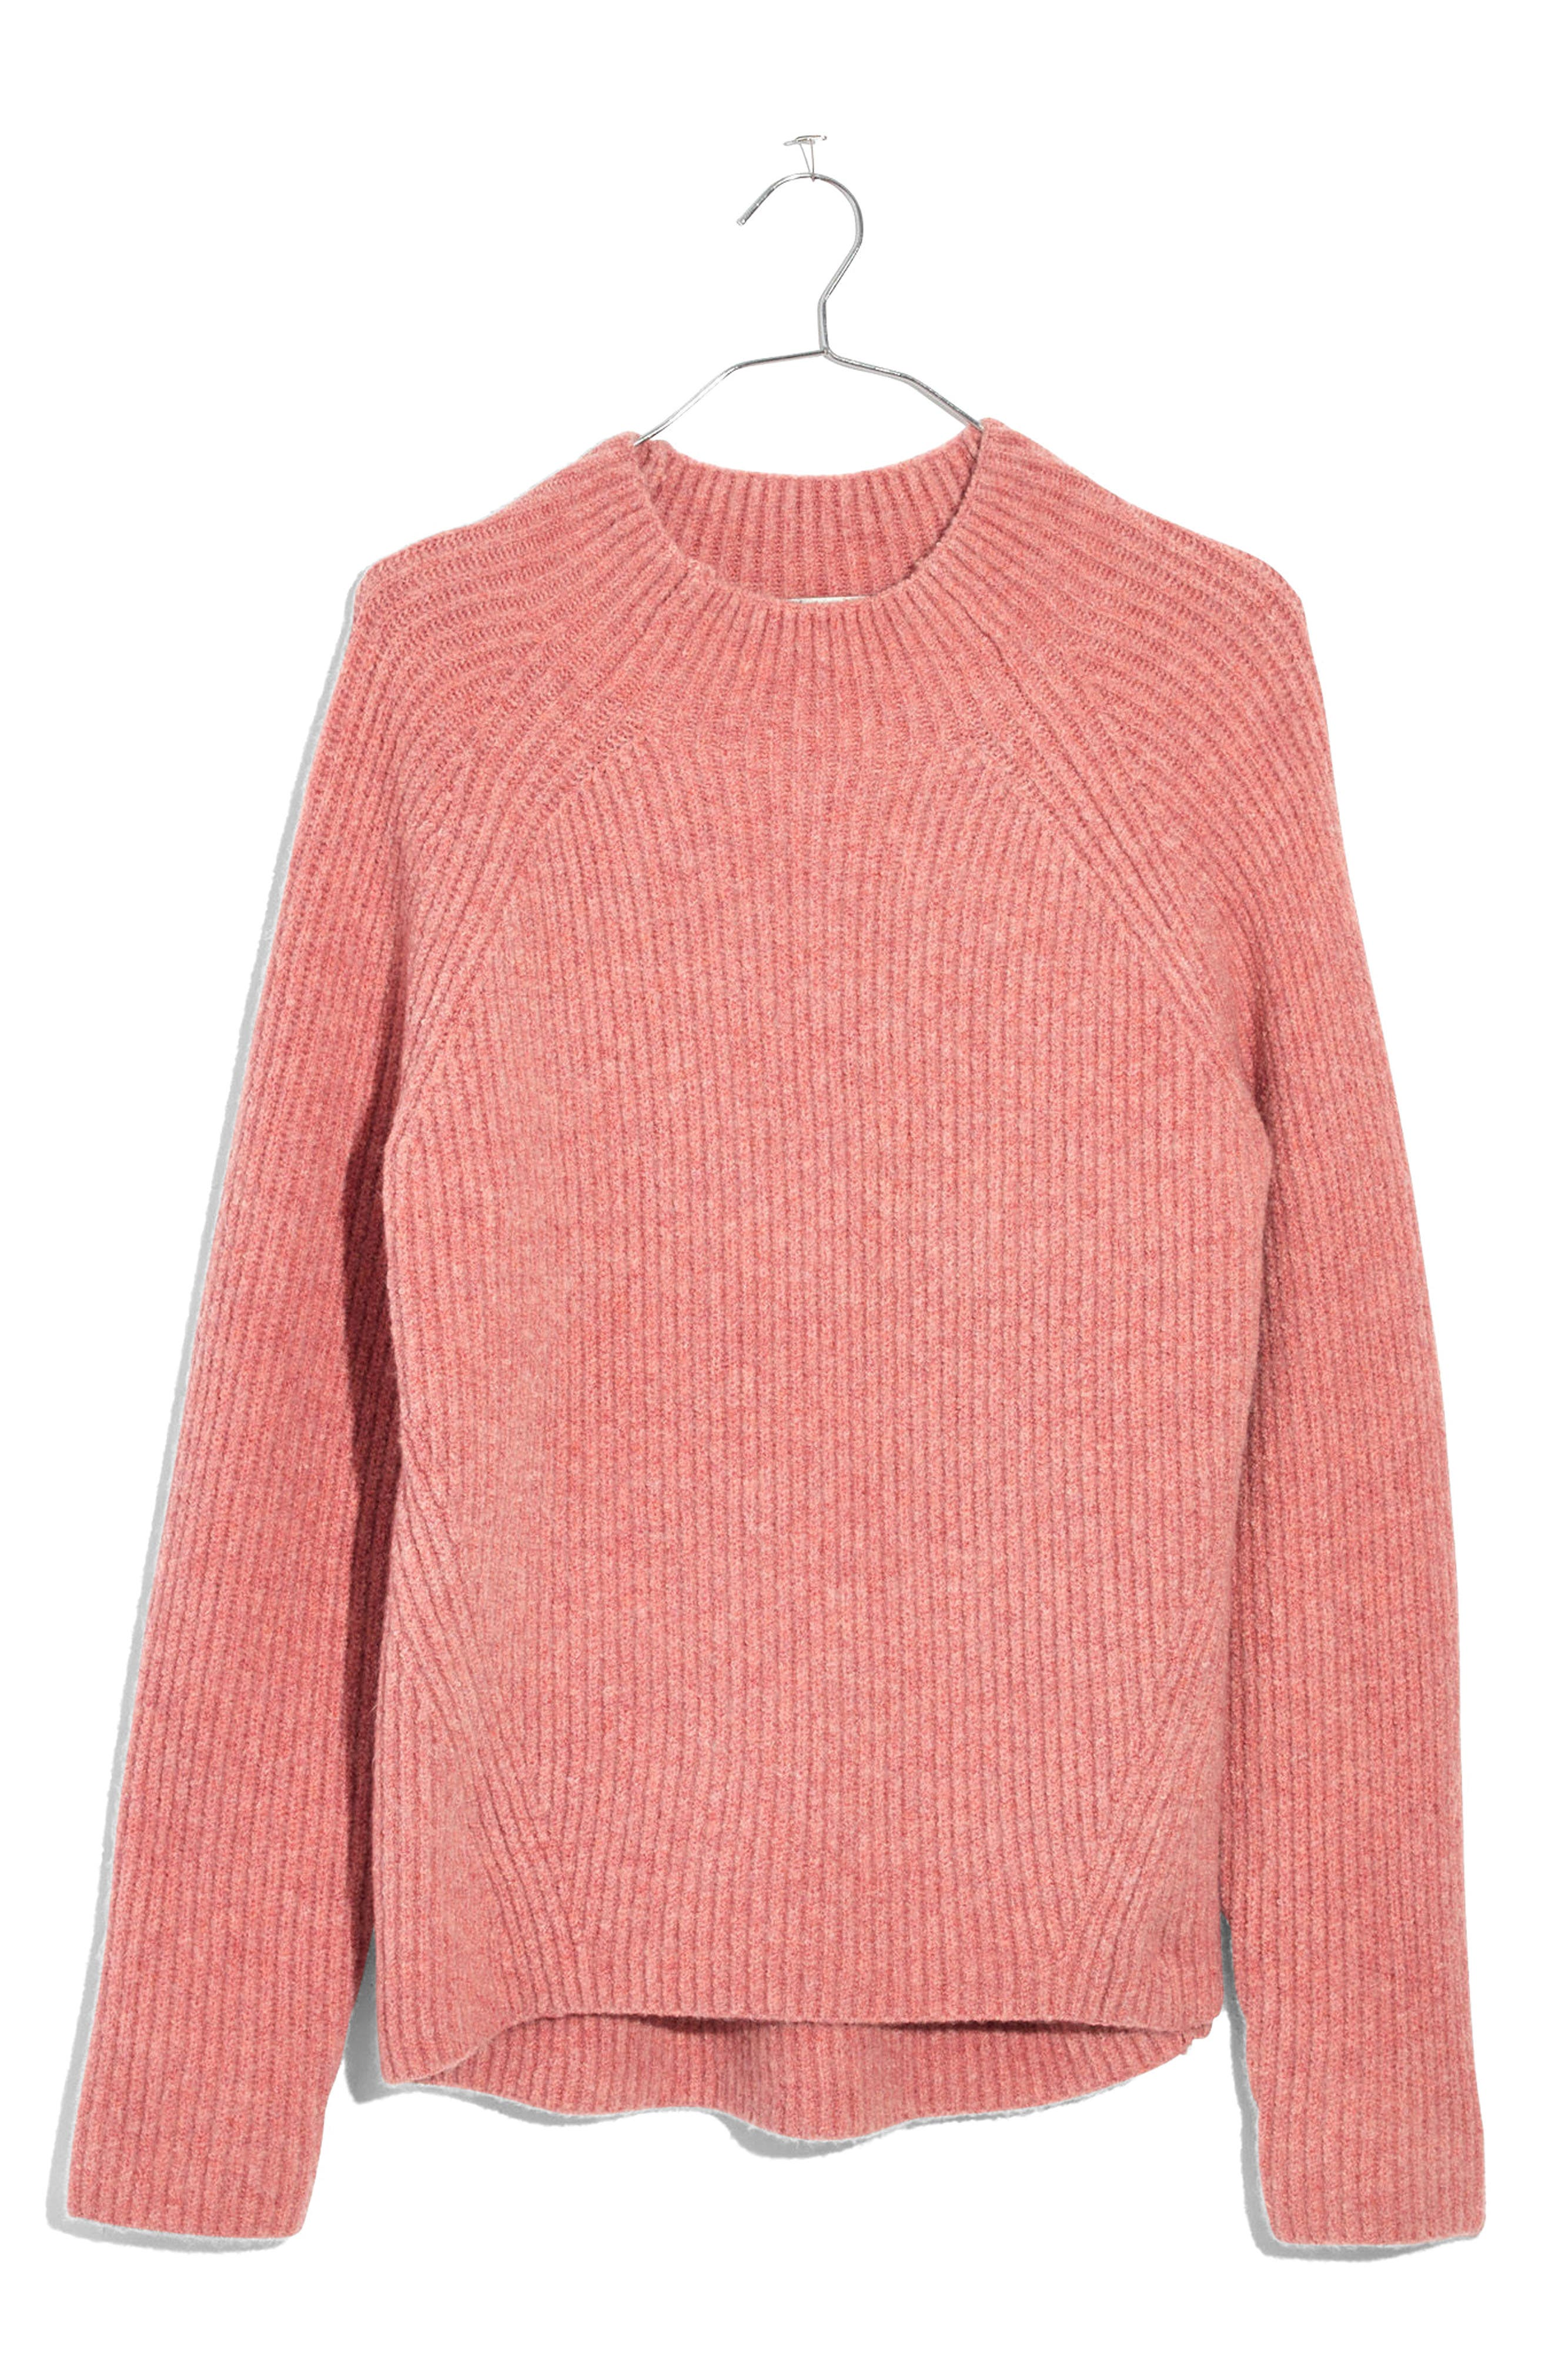 Northfield Mock Neck Sweater,                         Main,                         color, Heather Poinsettia